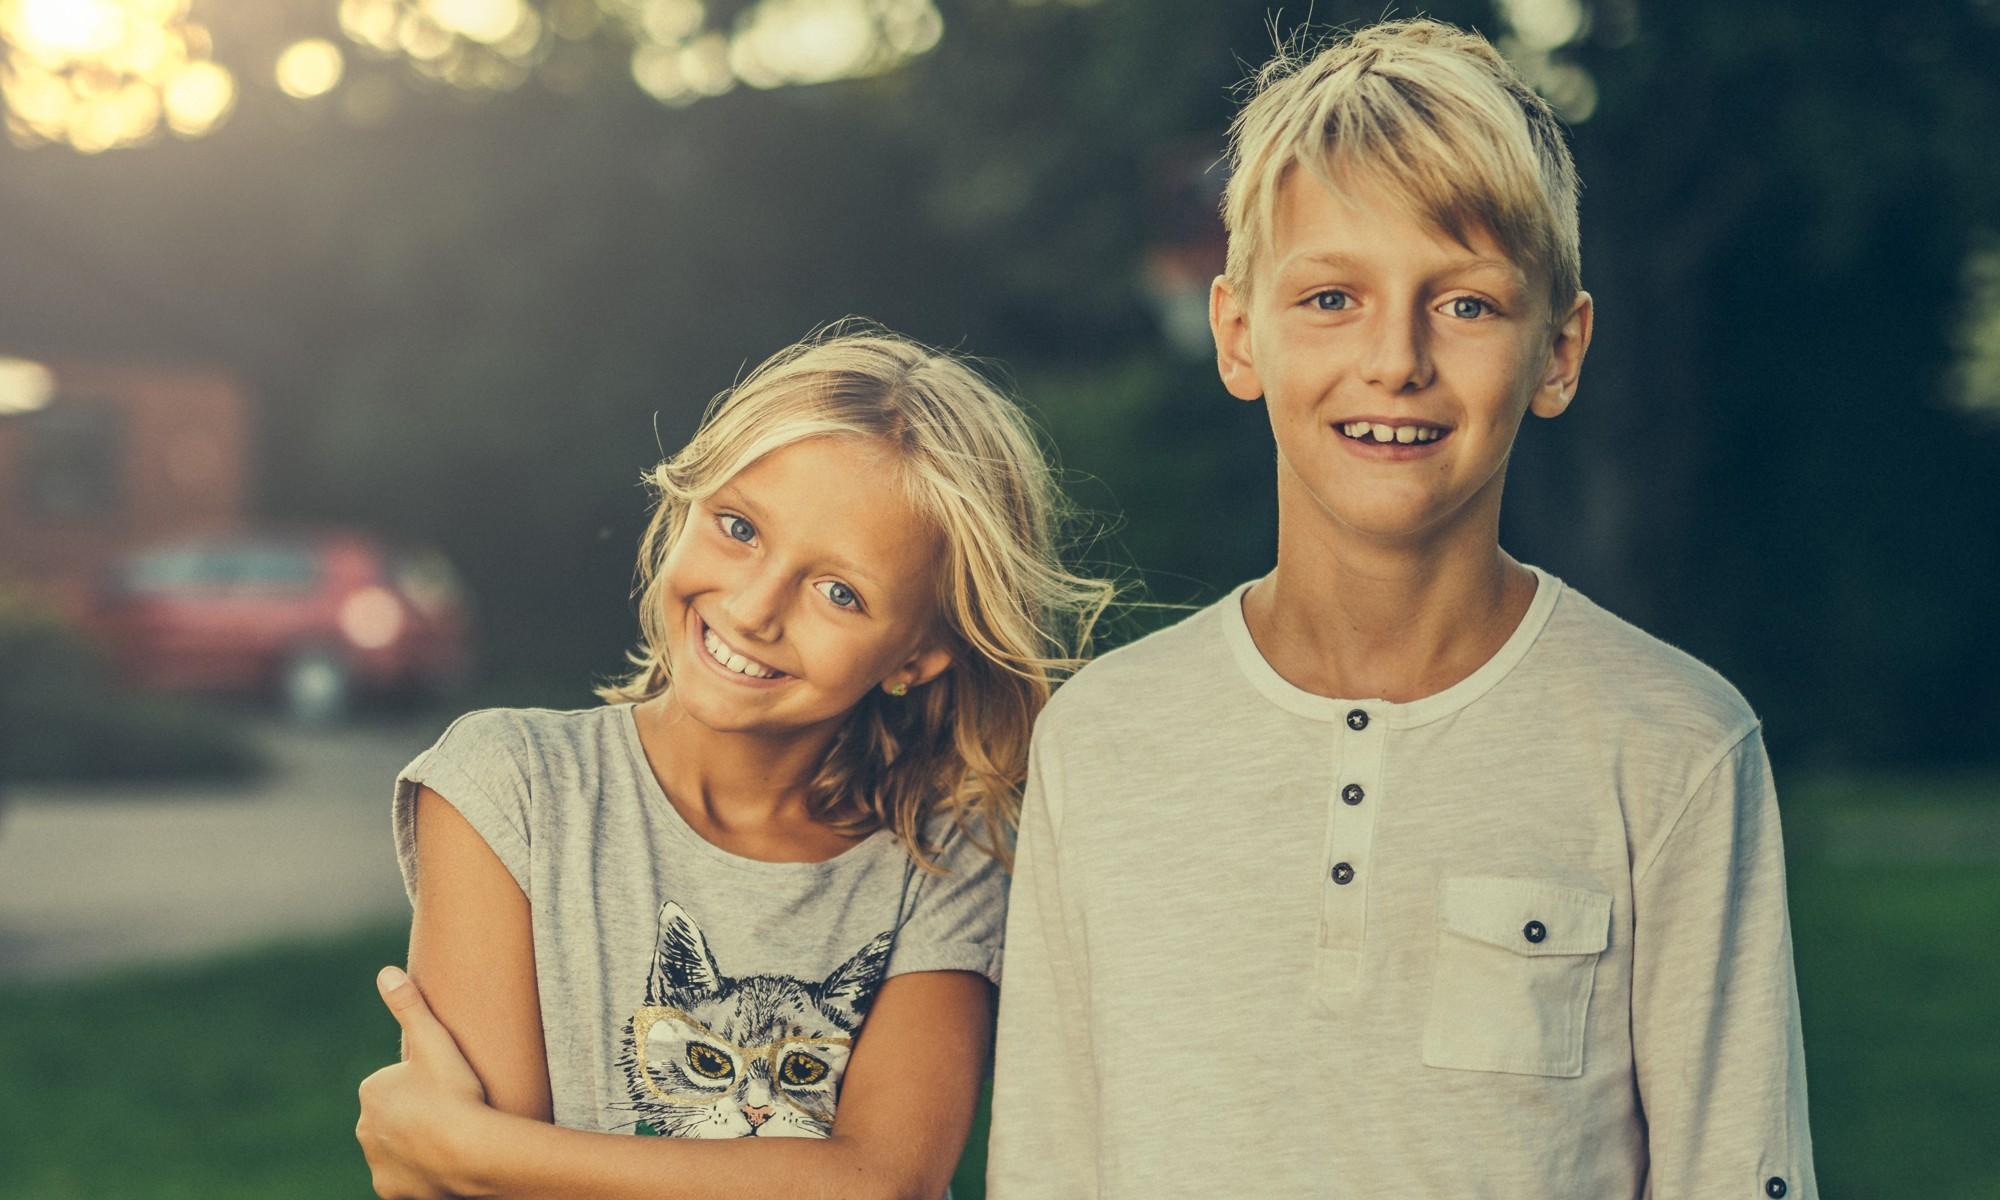 Barn glädje Hjälmareborg Tyringe Västmanland